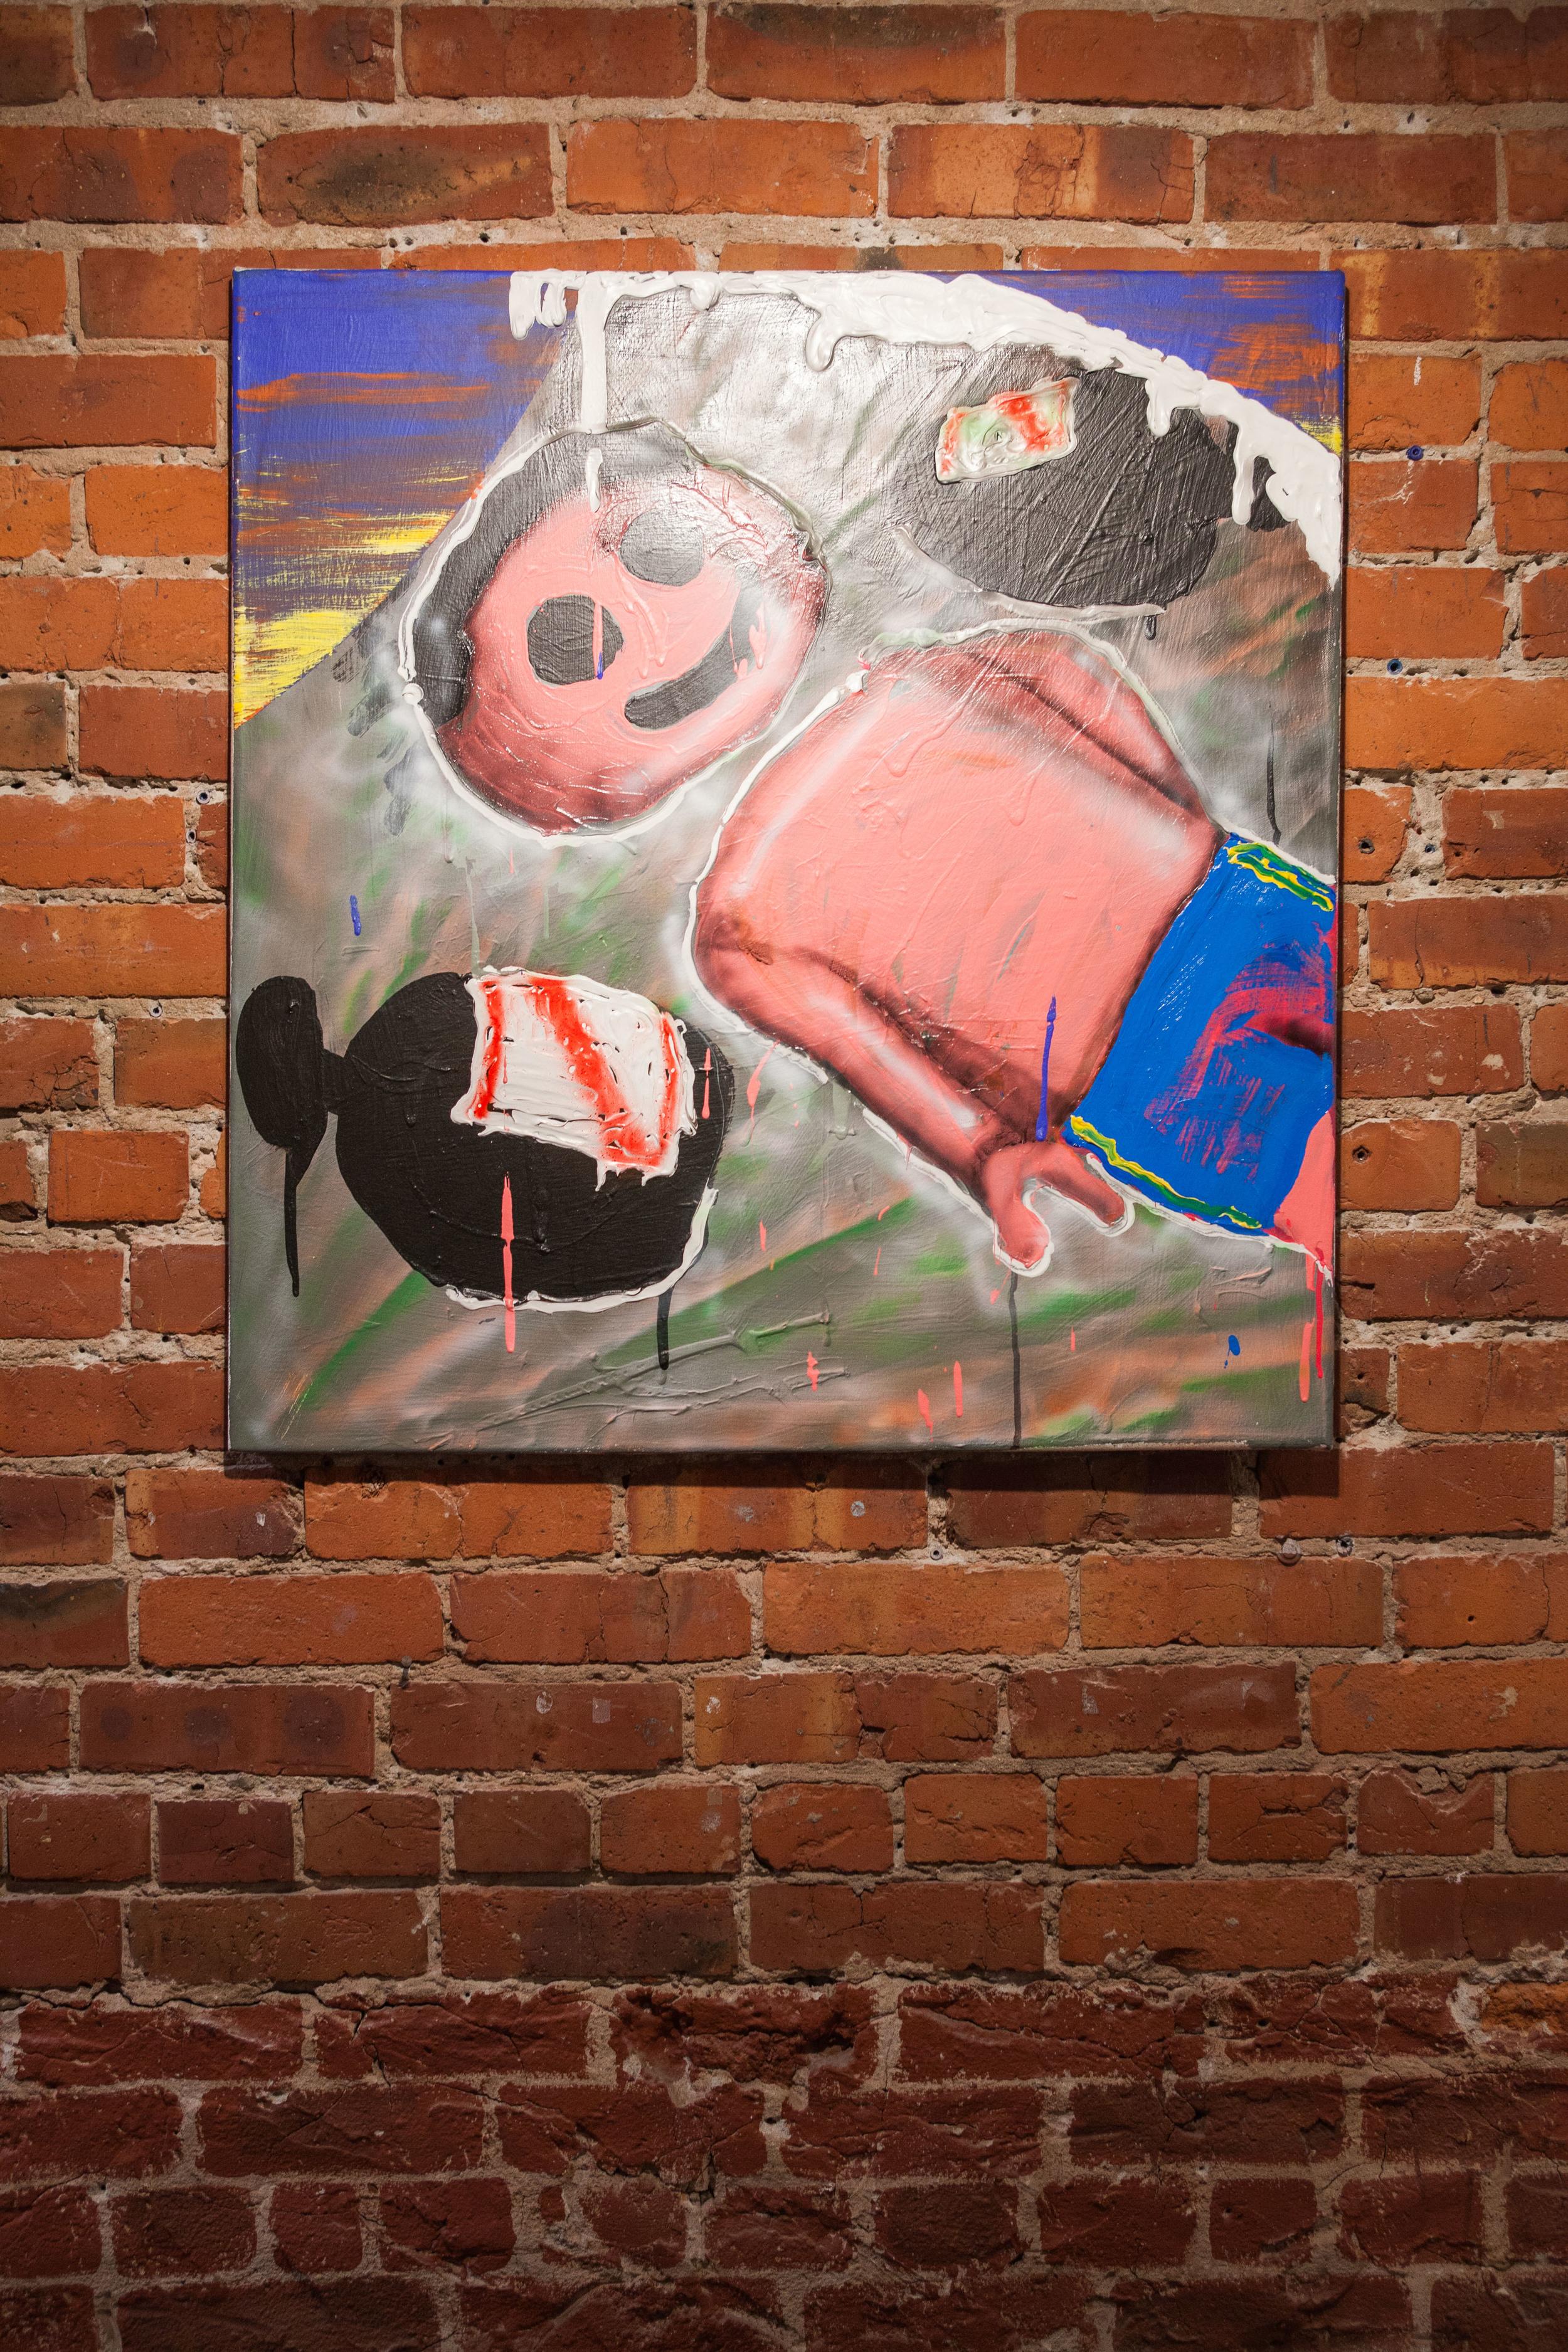 Royal Jarmon,  Break Fast , 2015  Acrylic and Enamel on Canvas, 32 x 30 x 3/4 in.